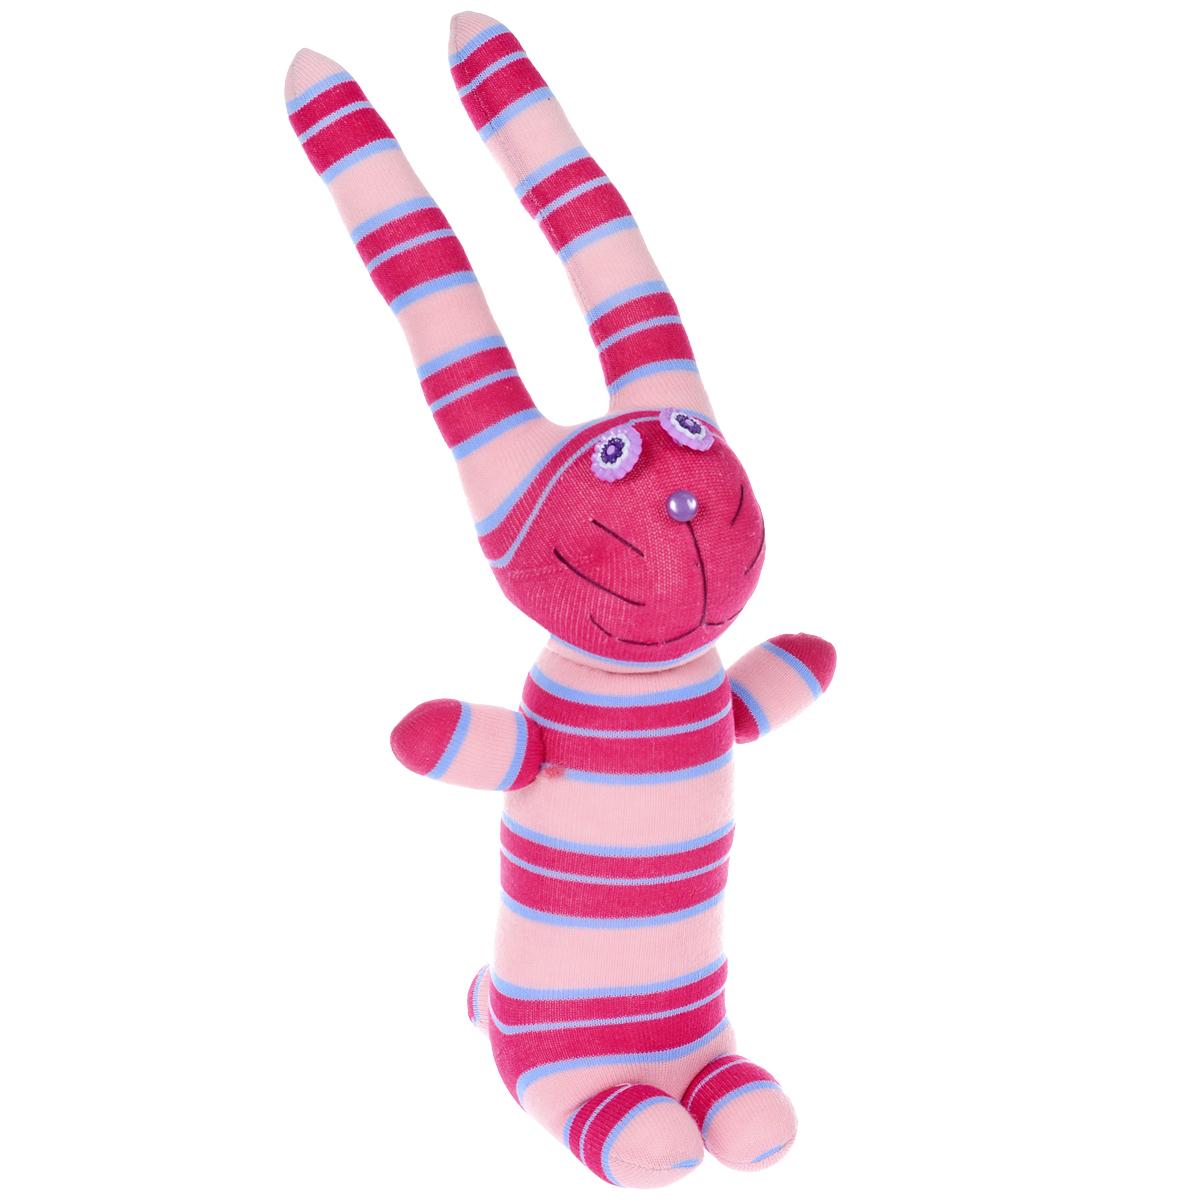 Игрушка Носкитос. Заяц Ромашка - Ручная авторская работа. НОС180614-59НОС180614-59